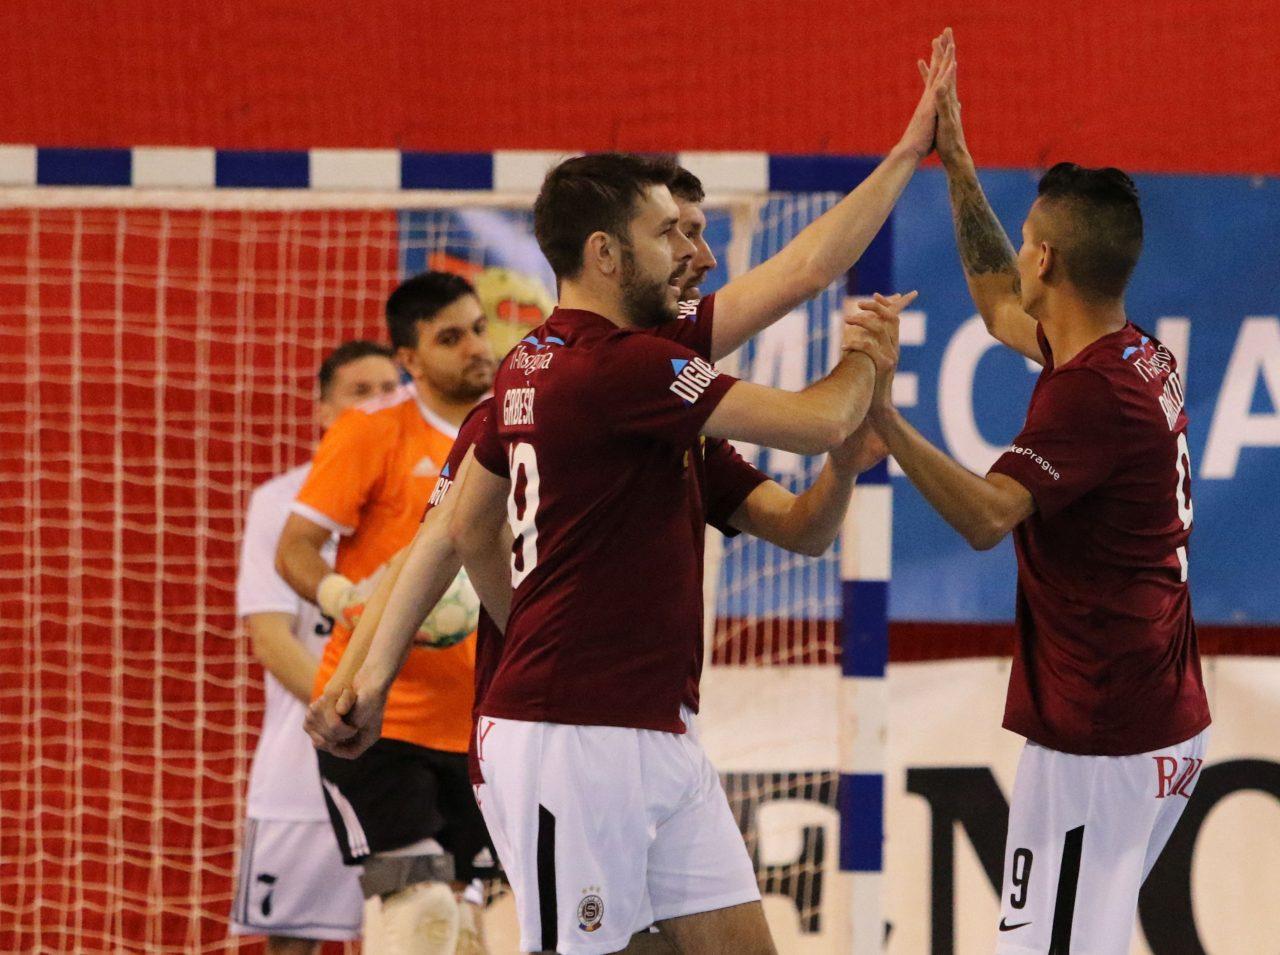 LIVESTREAM | AC Sparta Praha vs. Bazooka CF U. H.